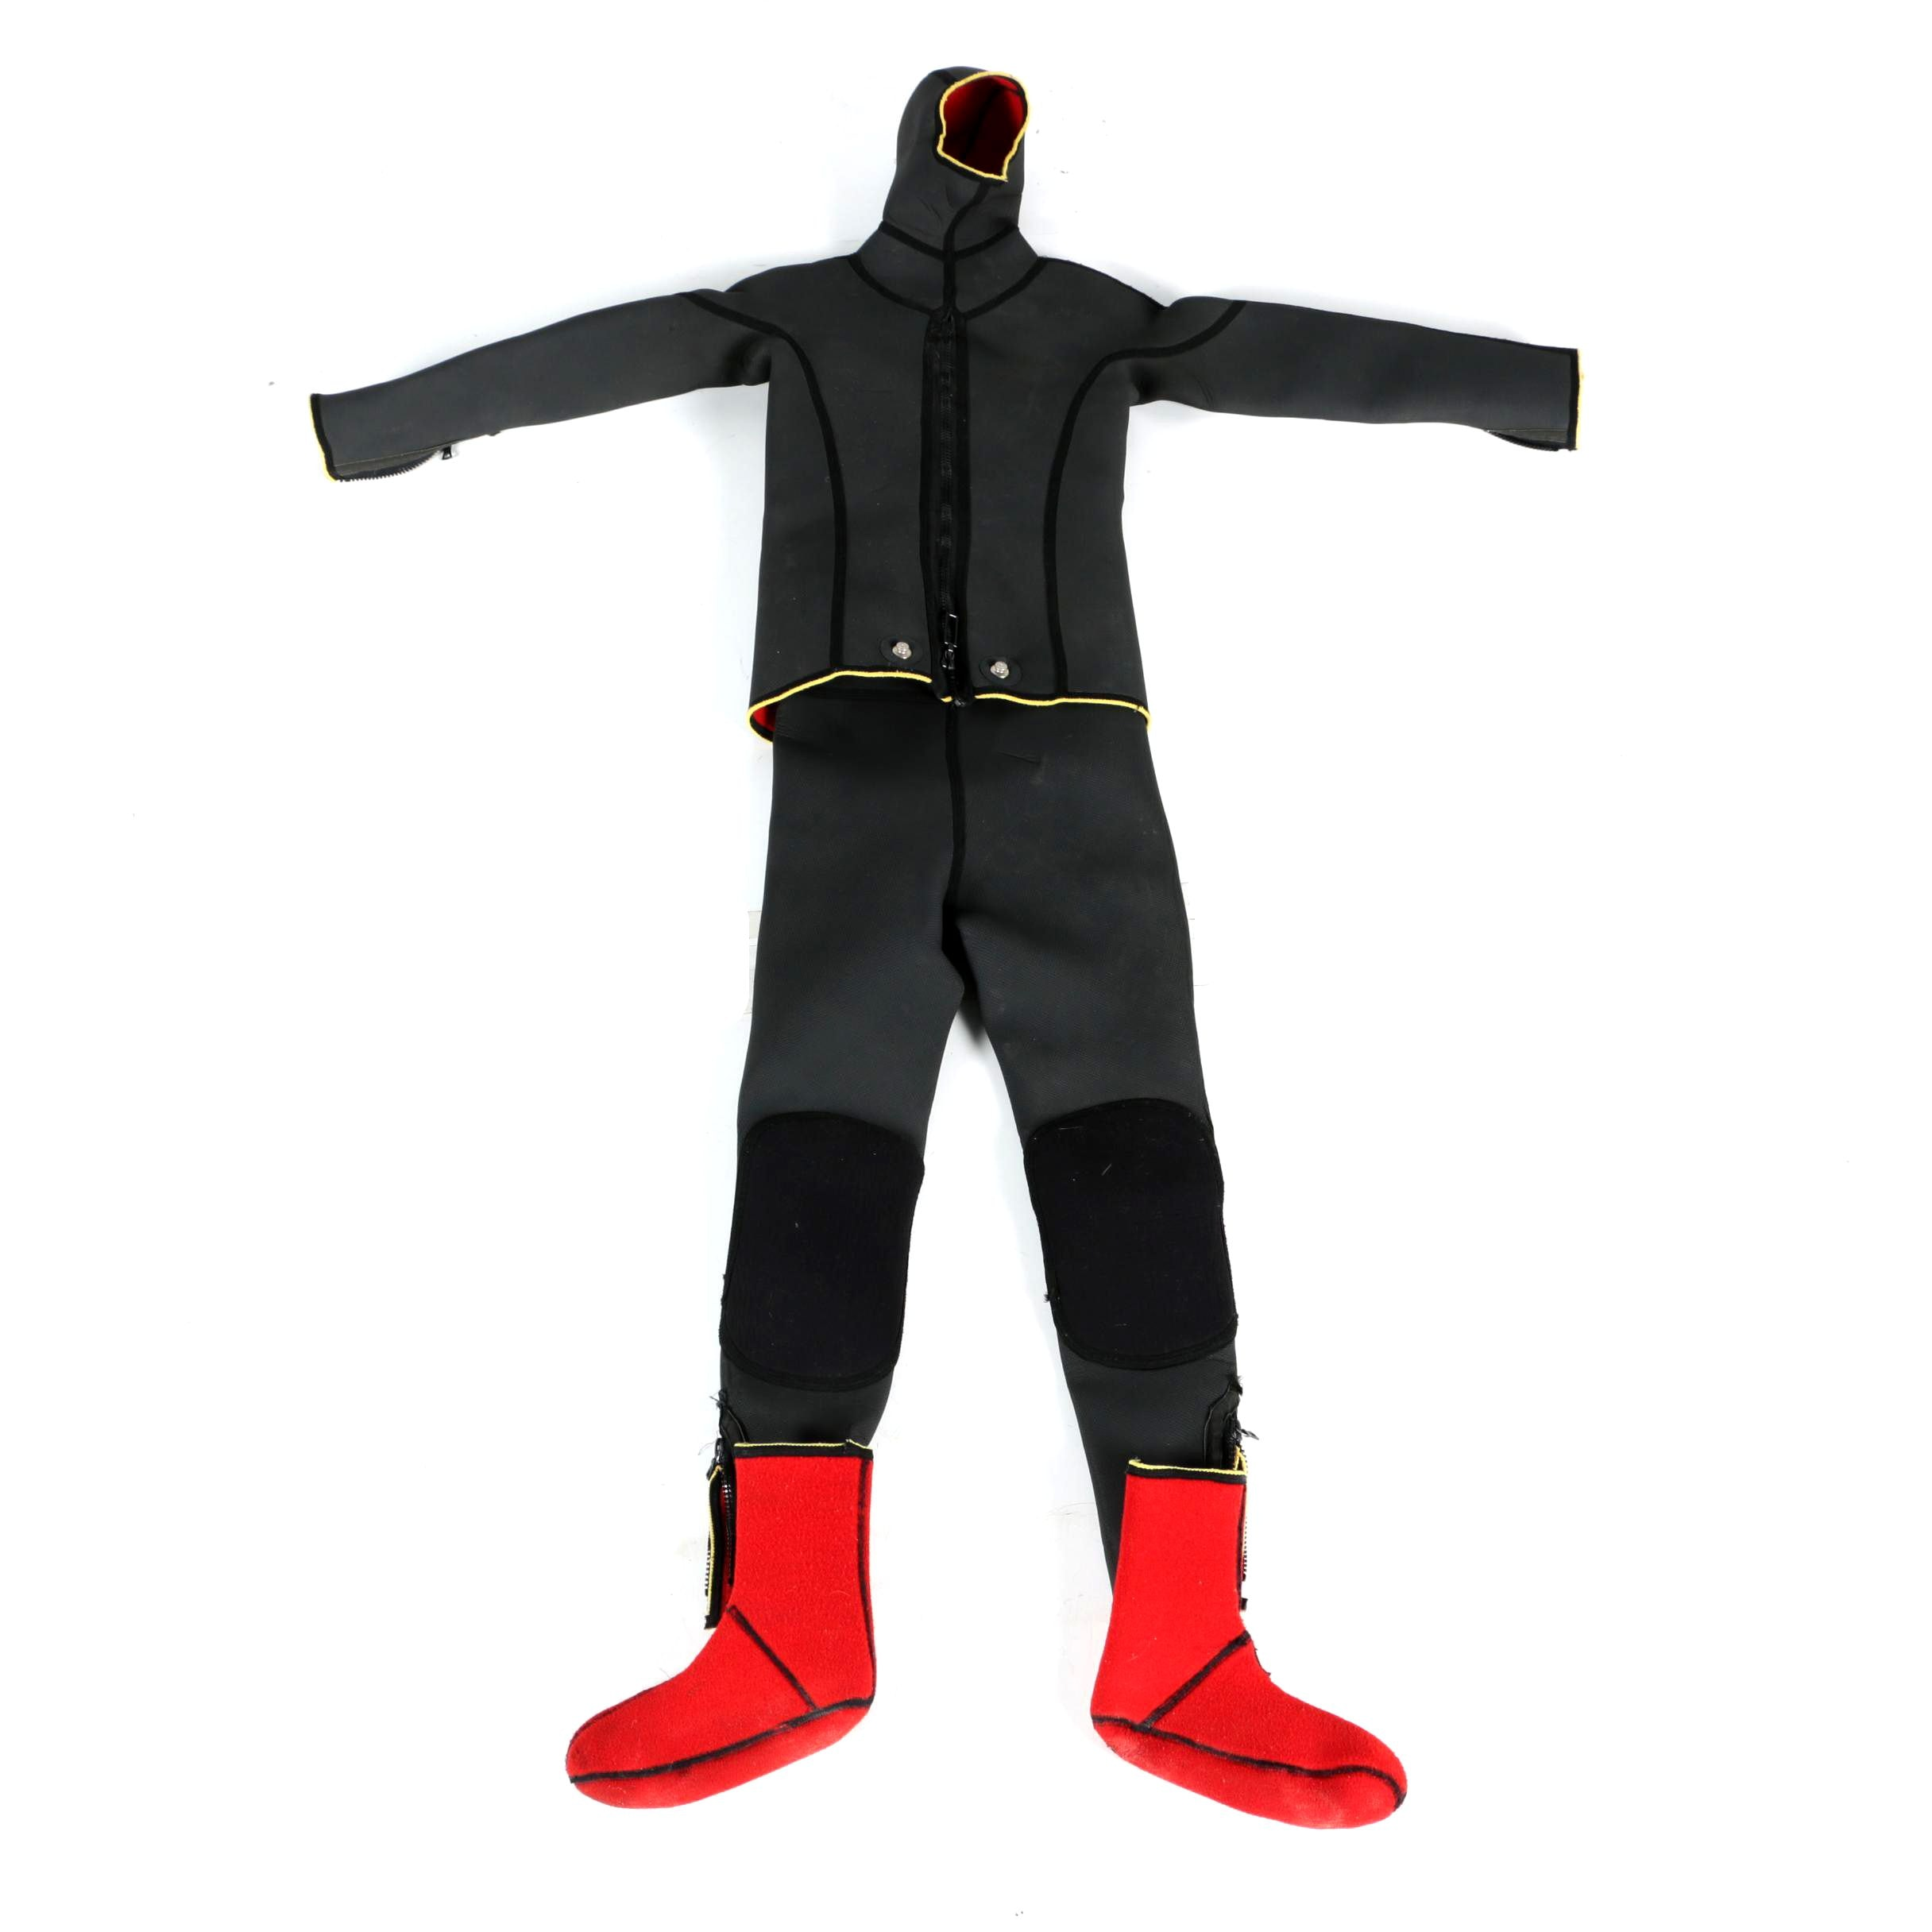 Scuba Suit and Boots